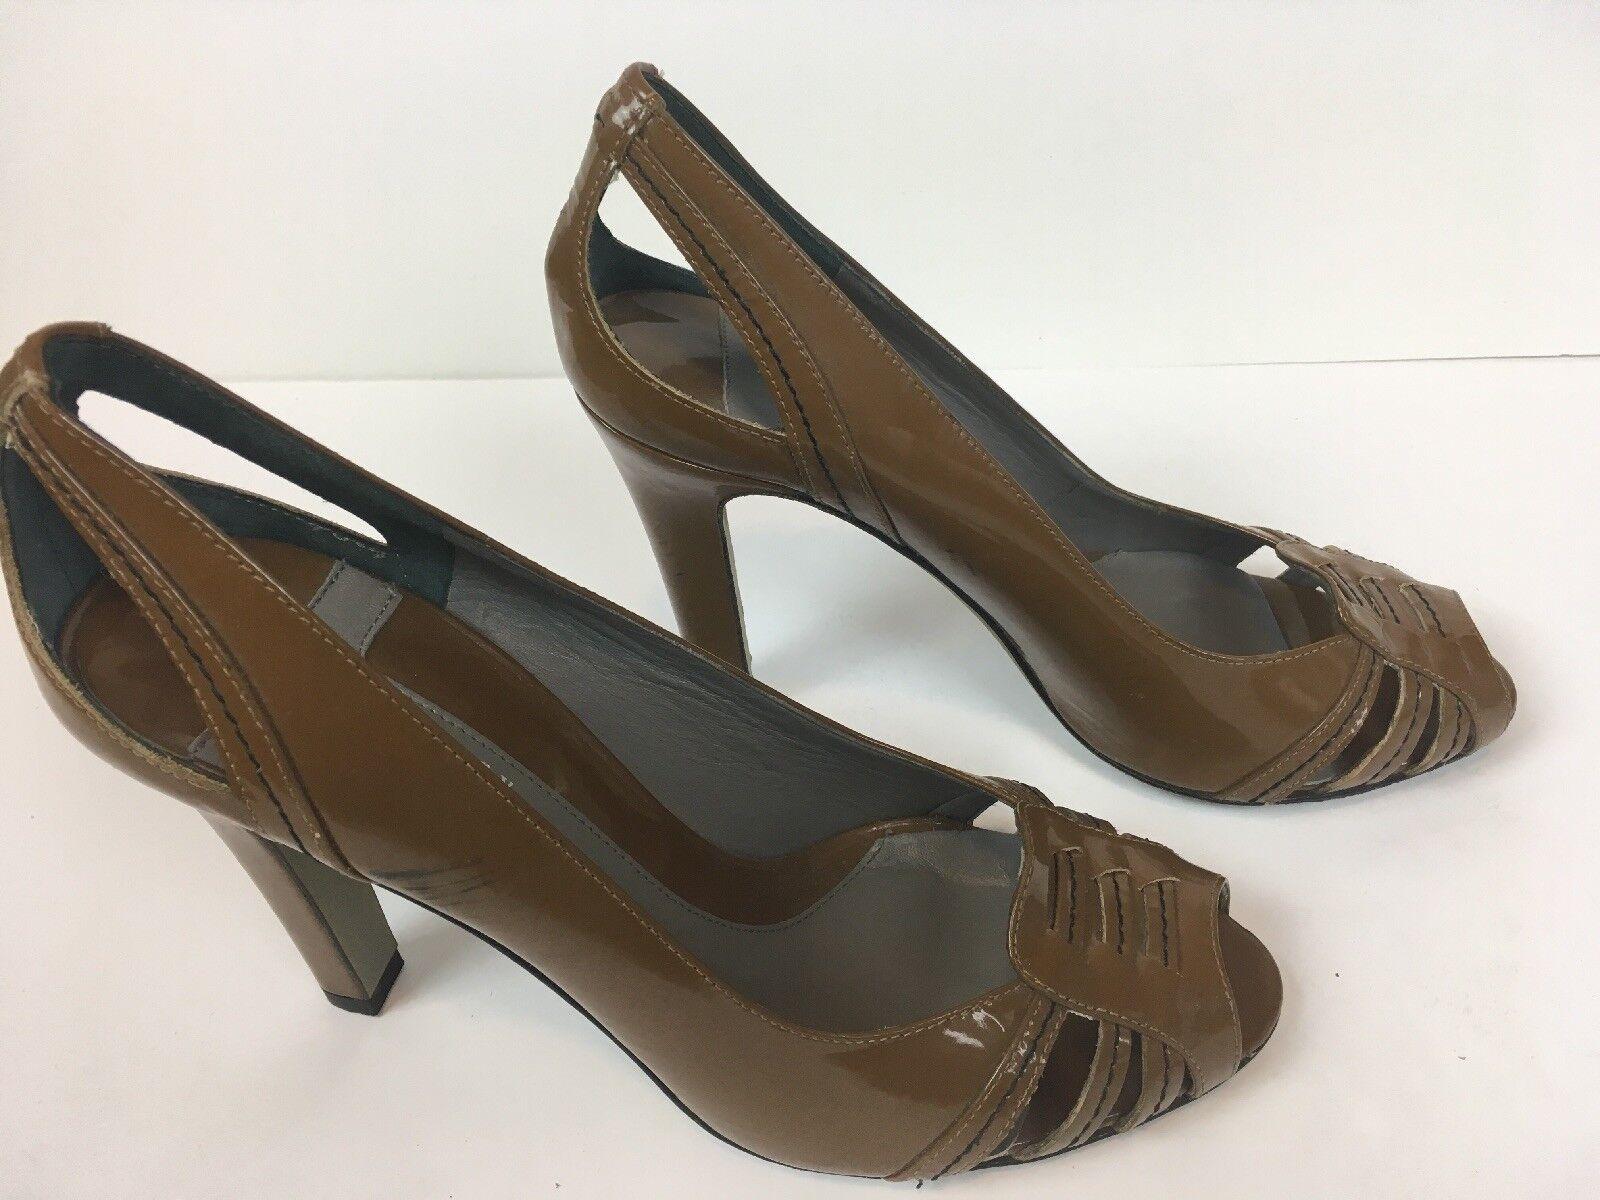 conveniente Theory donna scarpe Dimensione 39 Marrone Slingback Heels Heels Heels Leather Peep Toe Pumps SB1  risparmia il 50% -75% di sconto